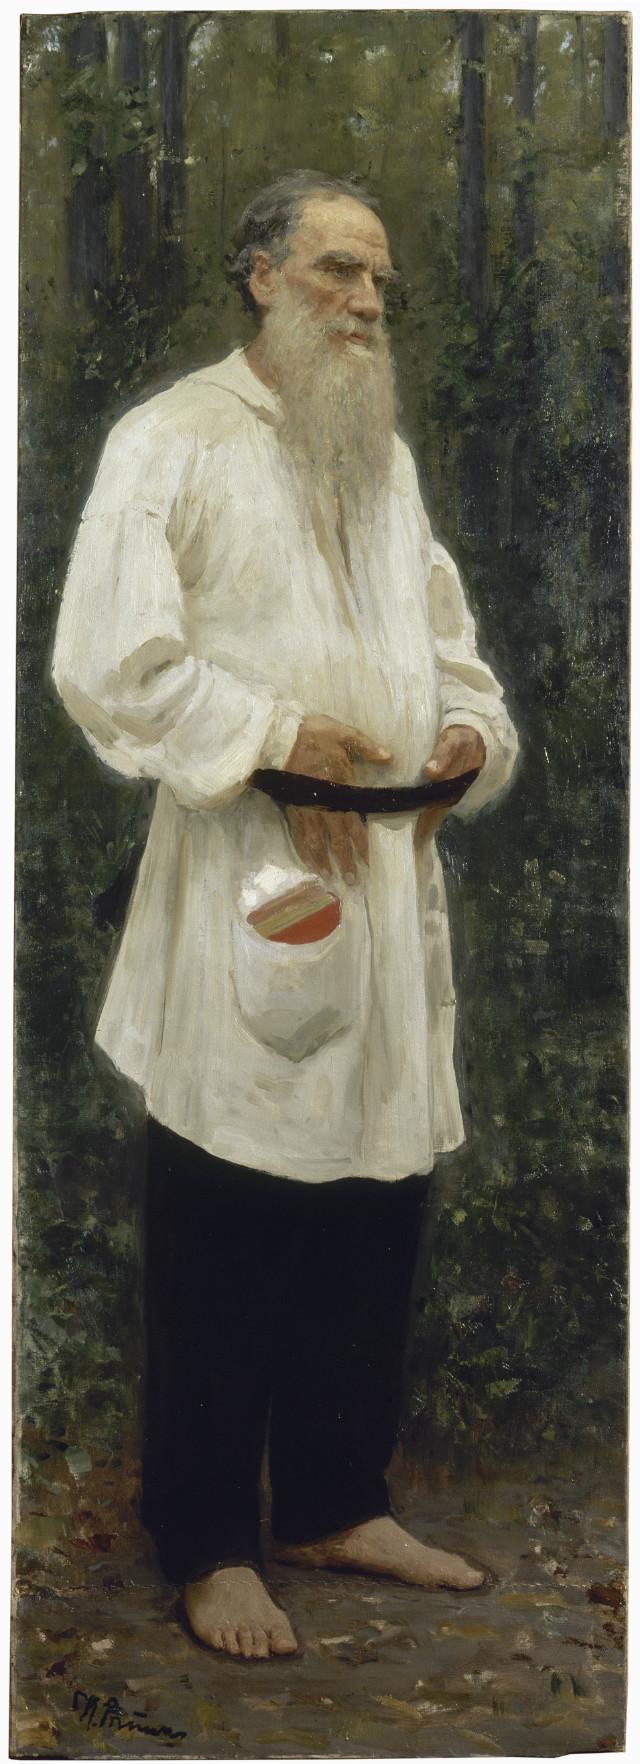 Tolstoy_by_Repin_1901.jpg